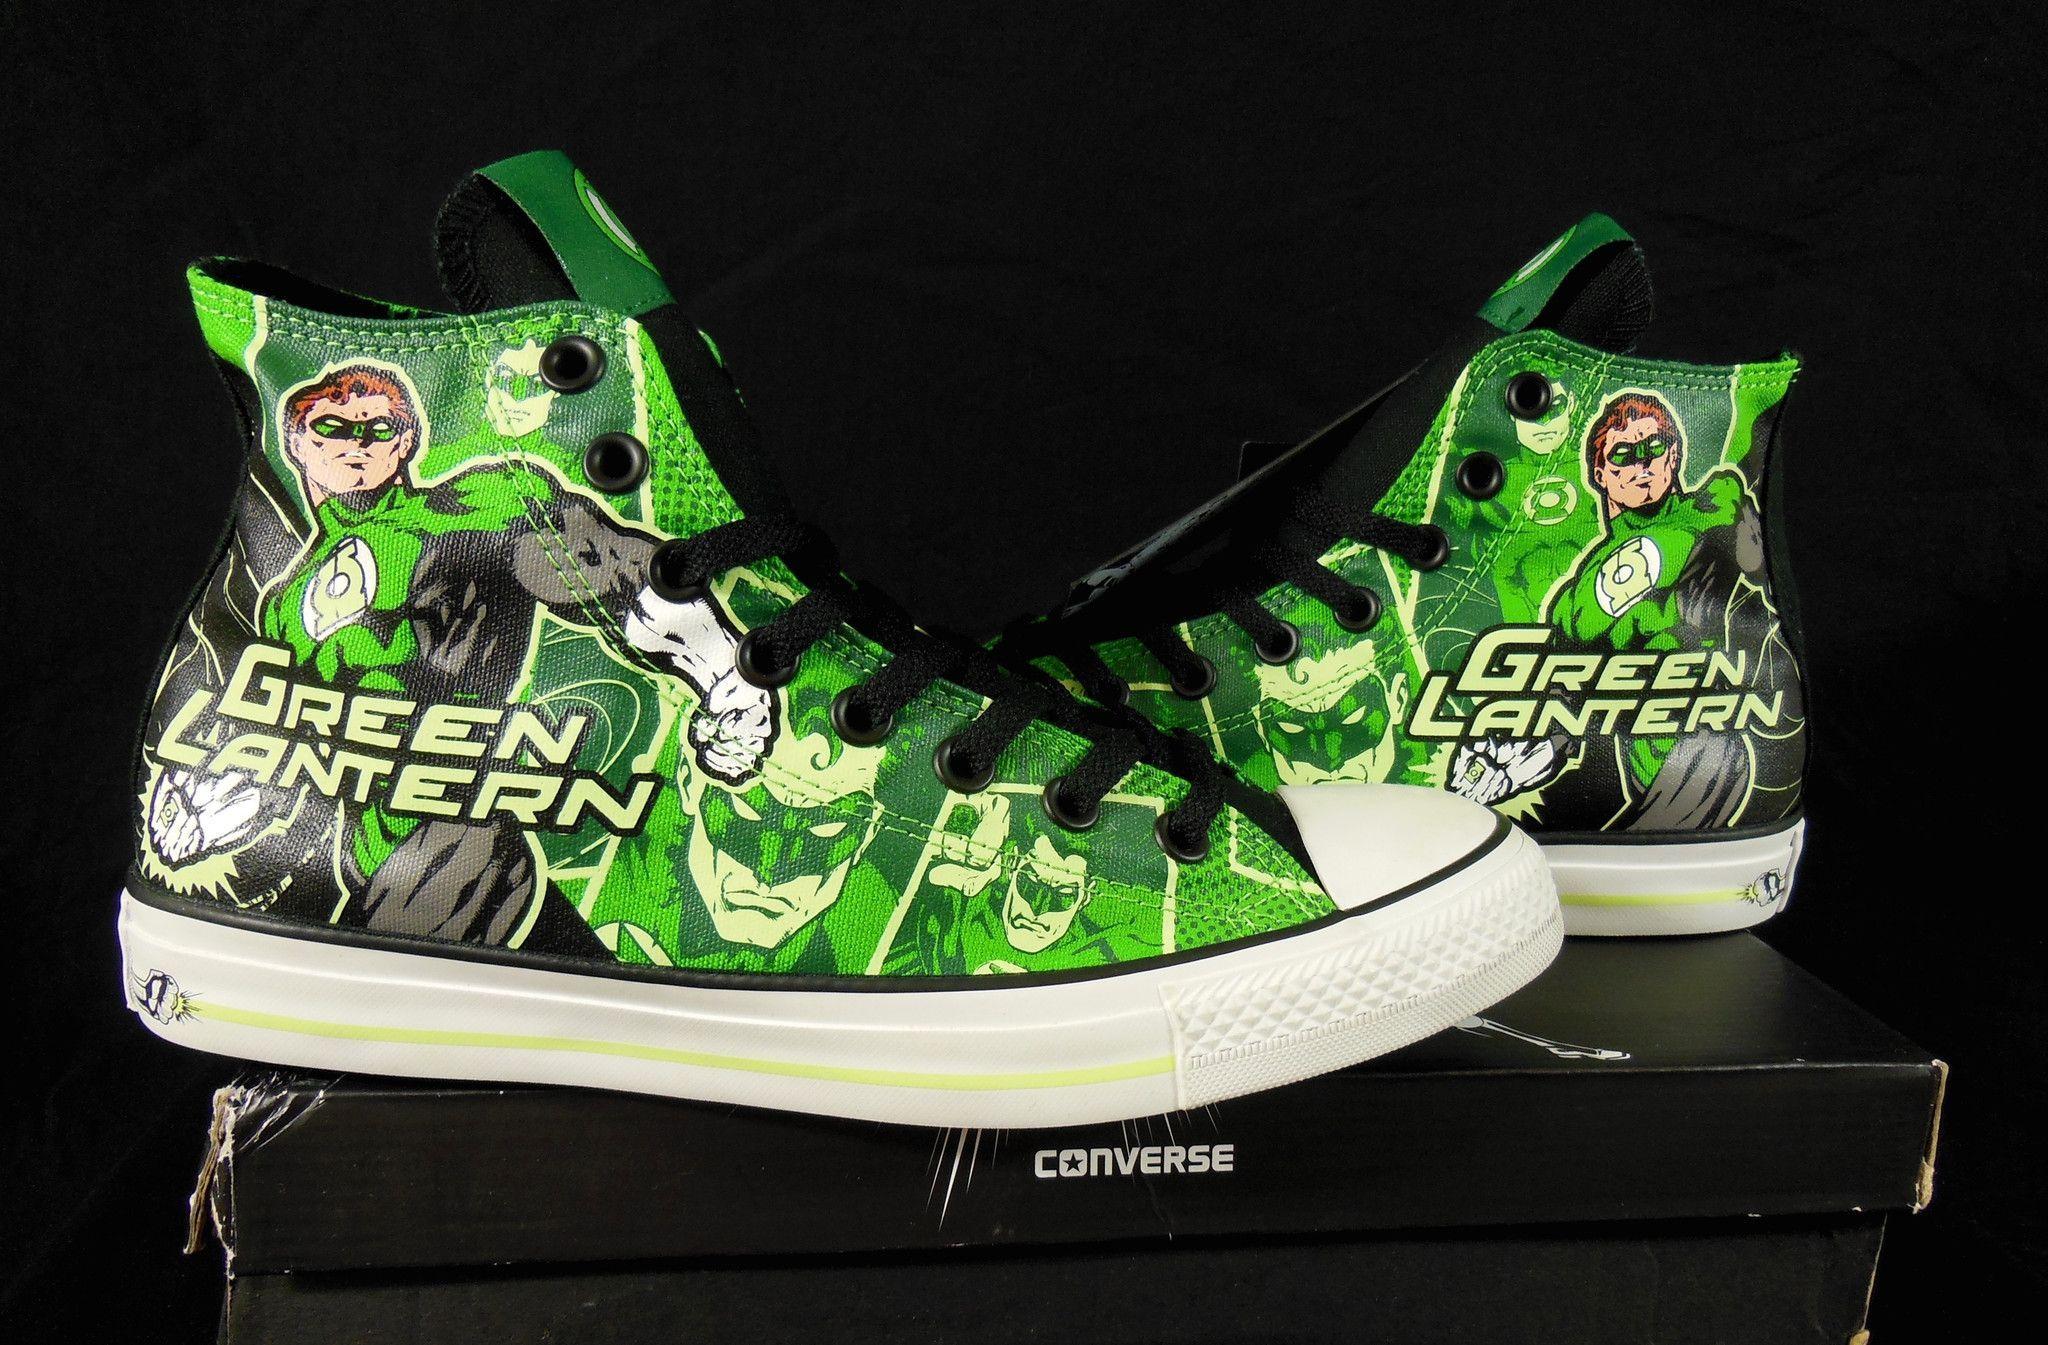 DC Comics x Chuck Taylor All Star 'Green Lantern' Converse